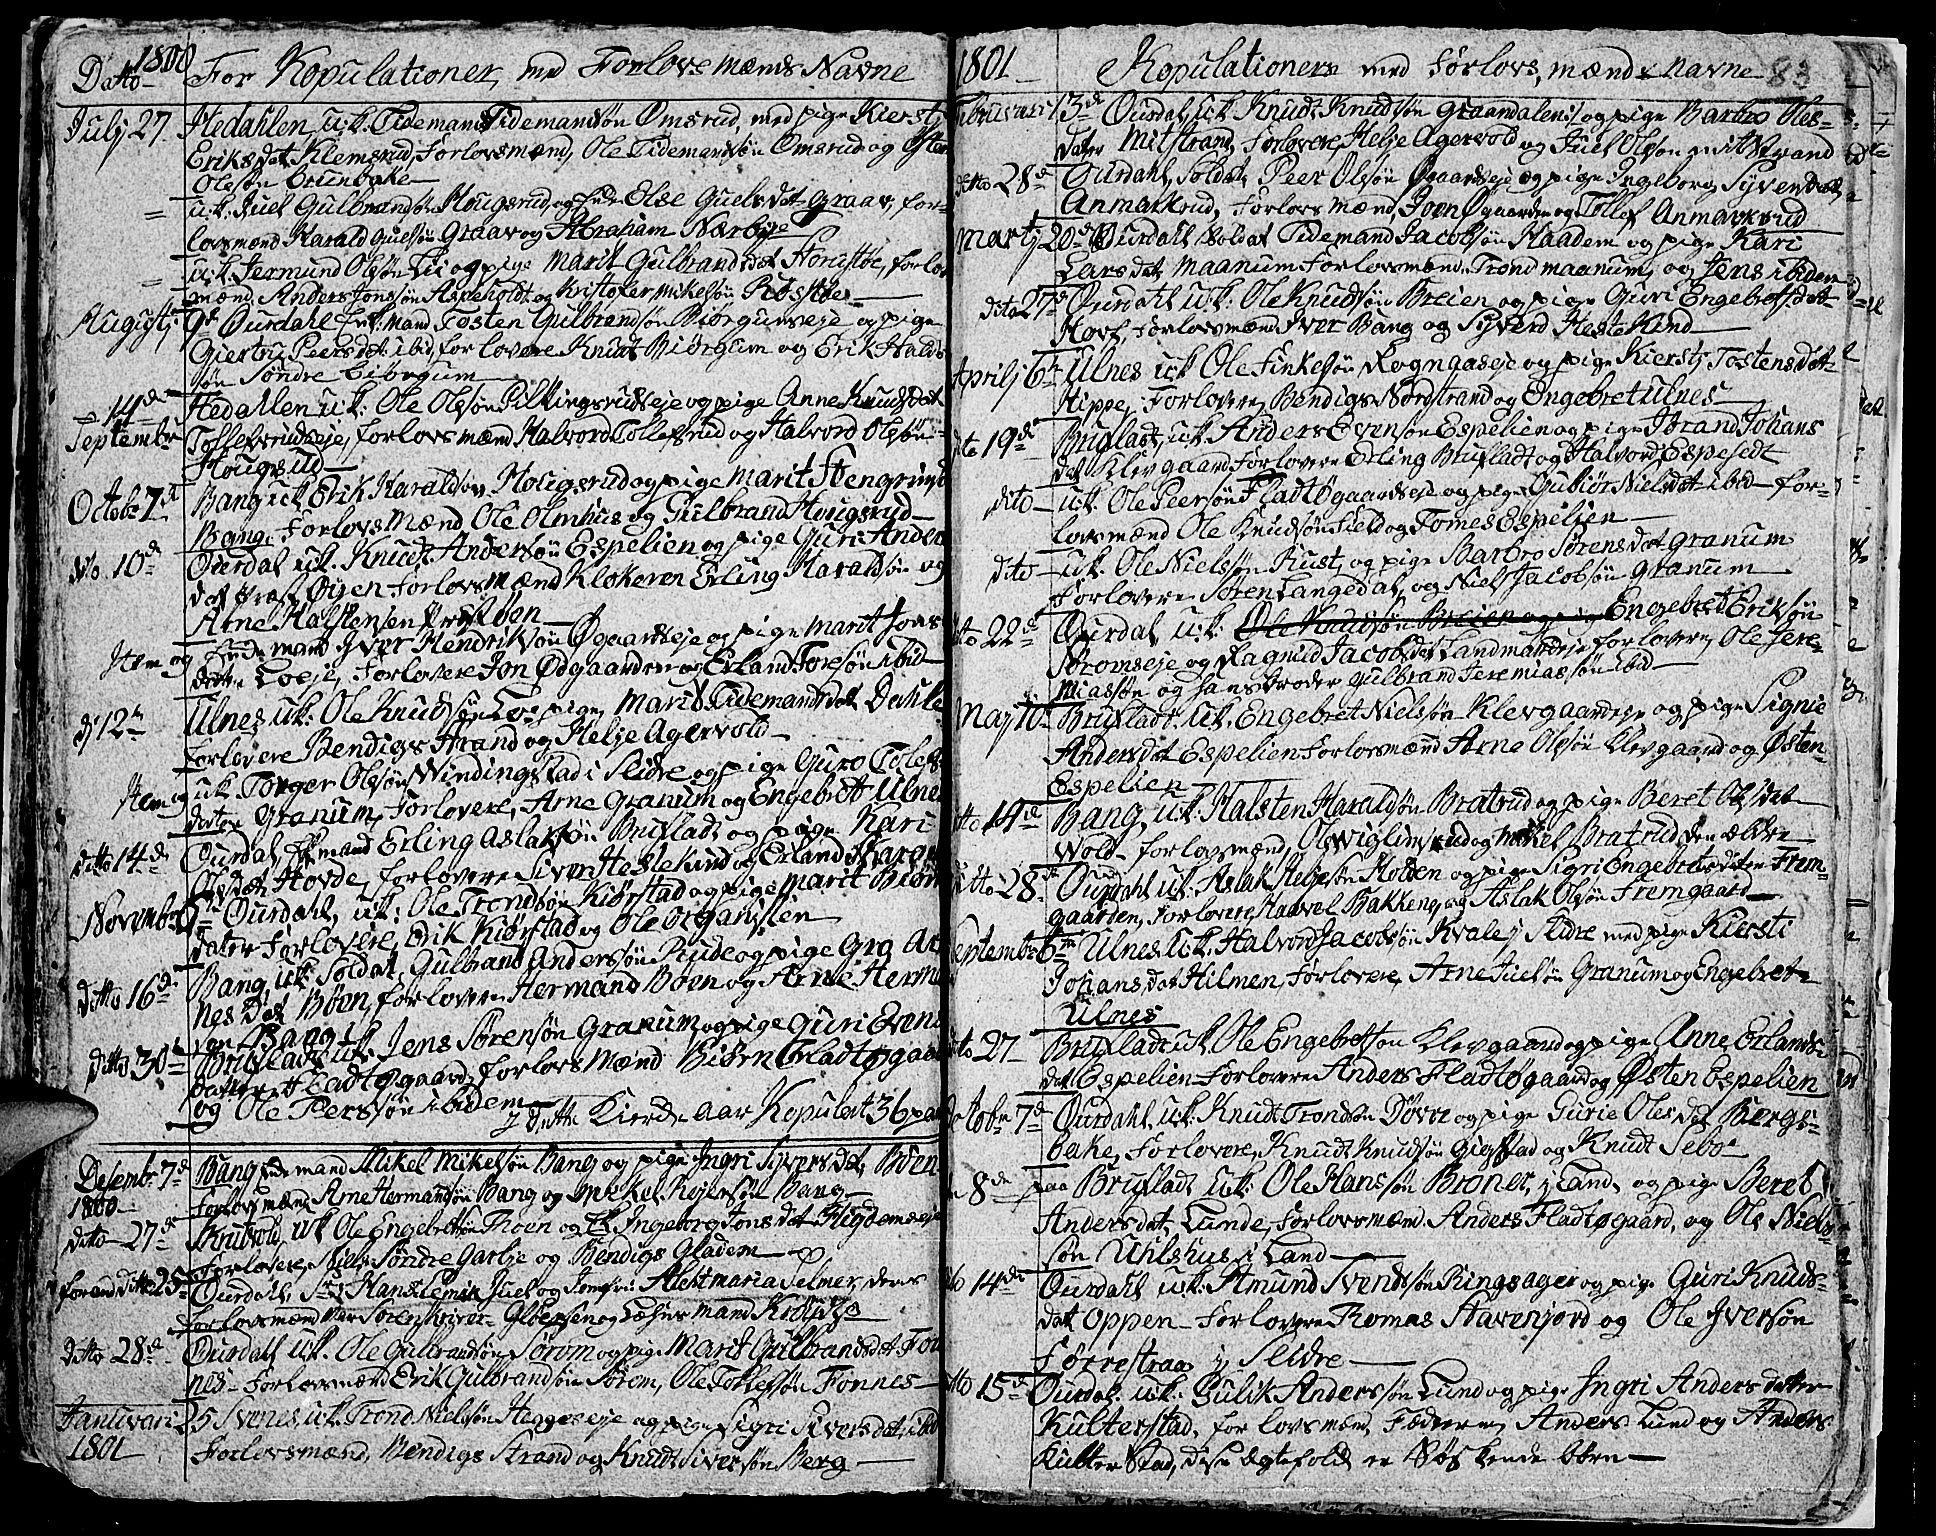 SAH, Aurdal prestekontor, Ministerialbok nr. 7, 1800-1808, s. 83